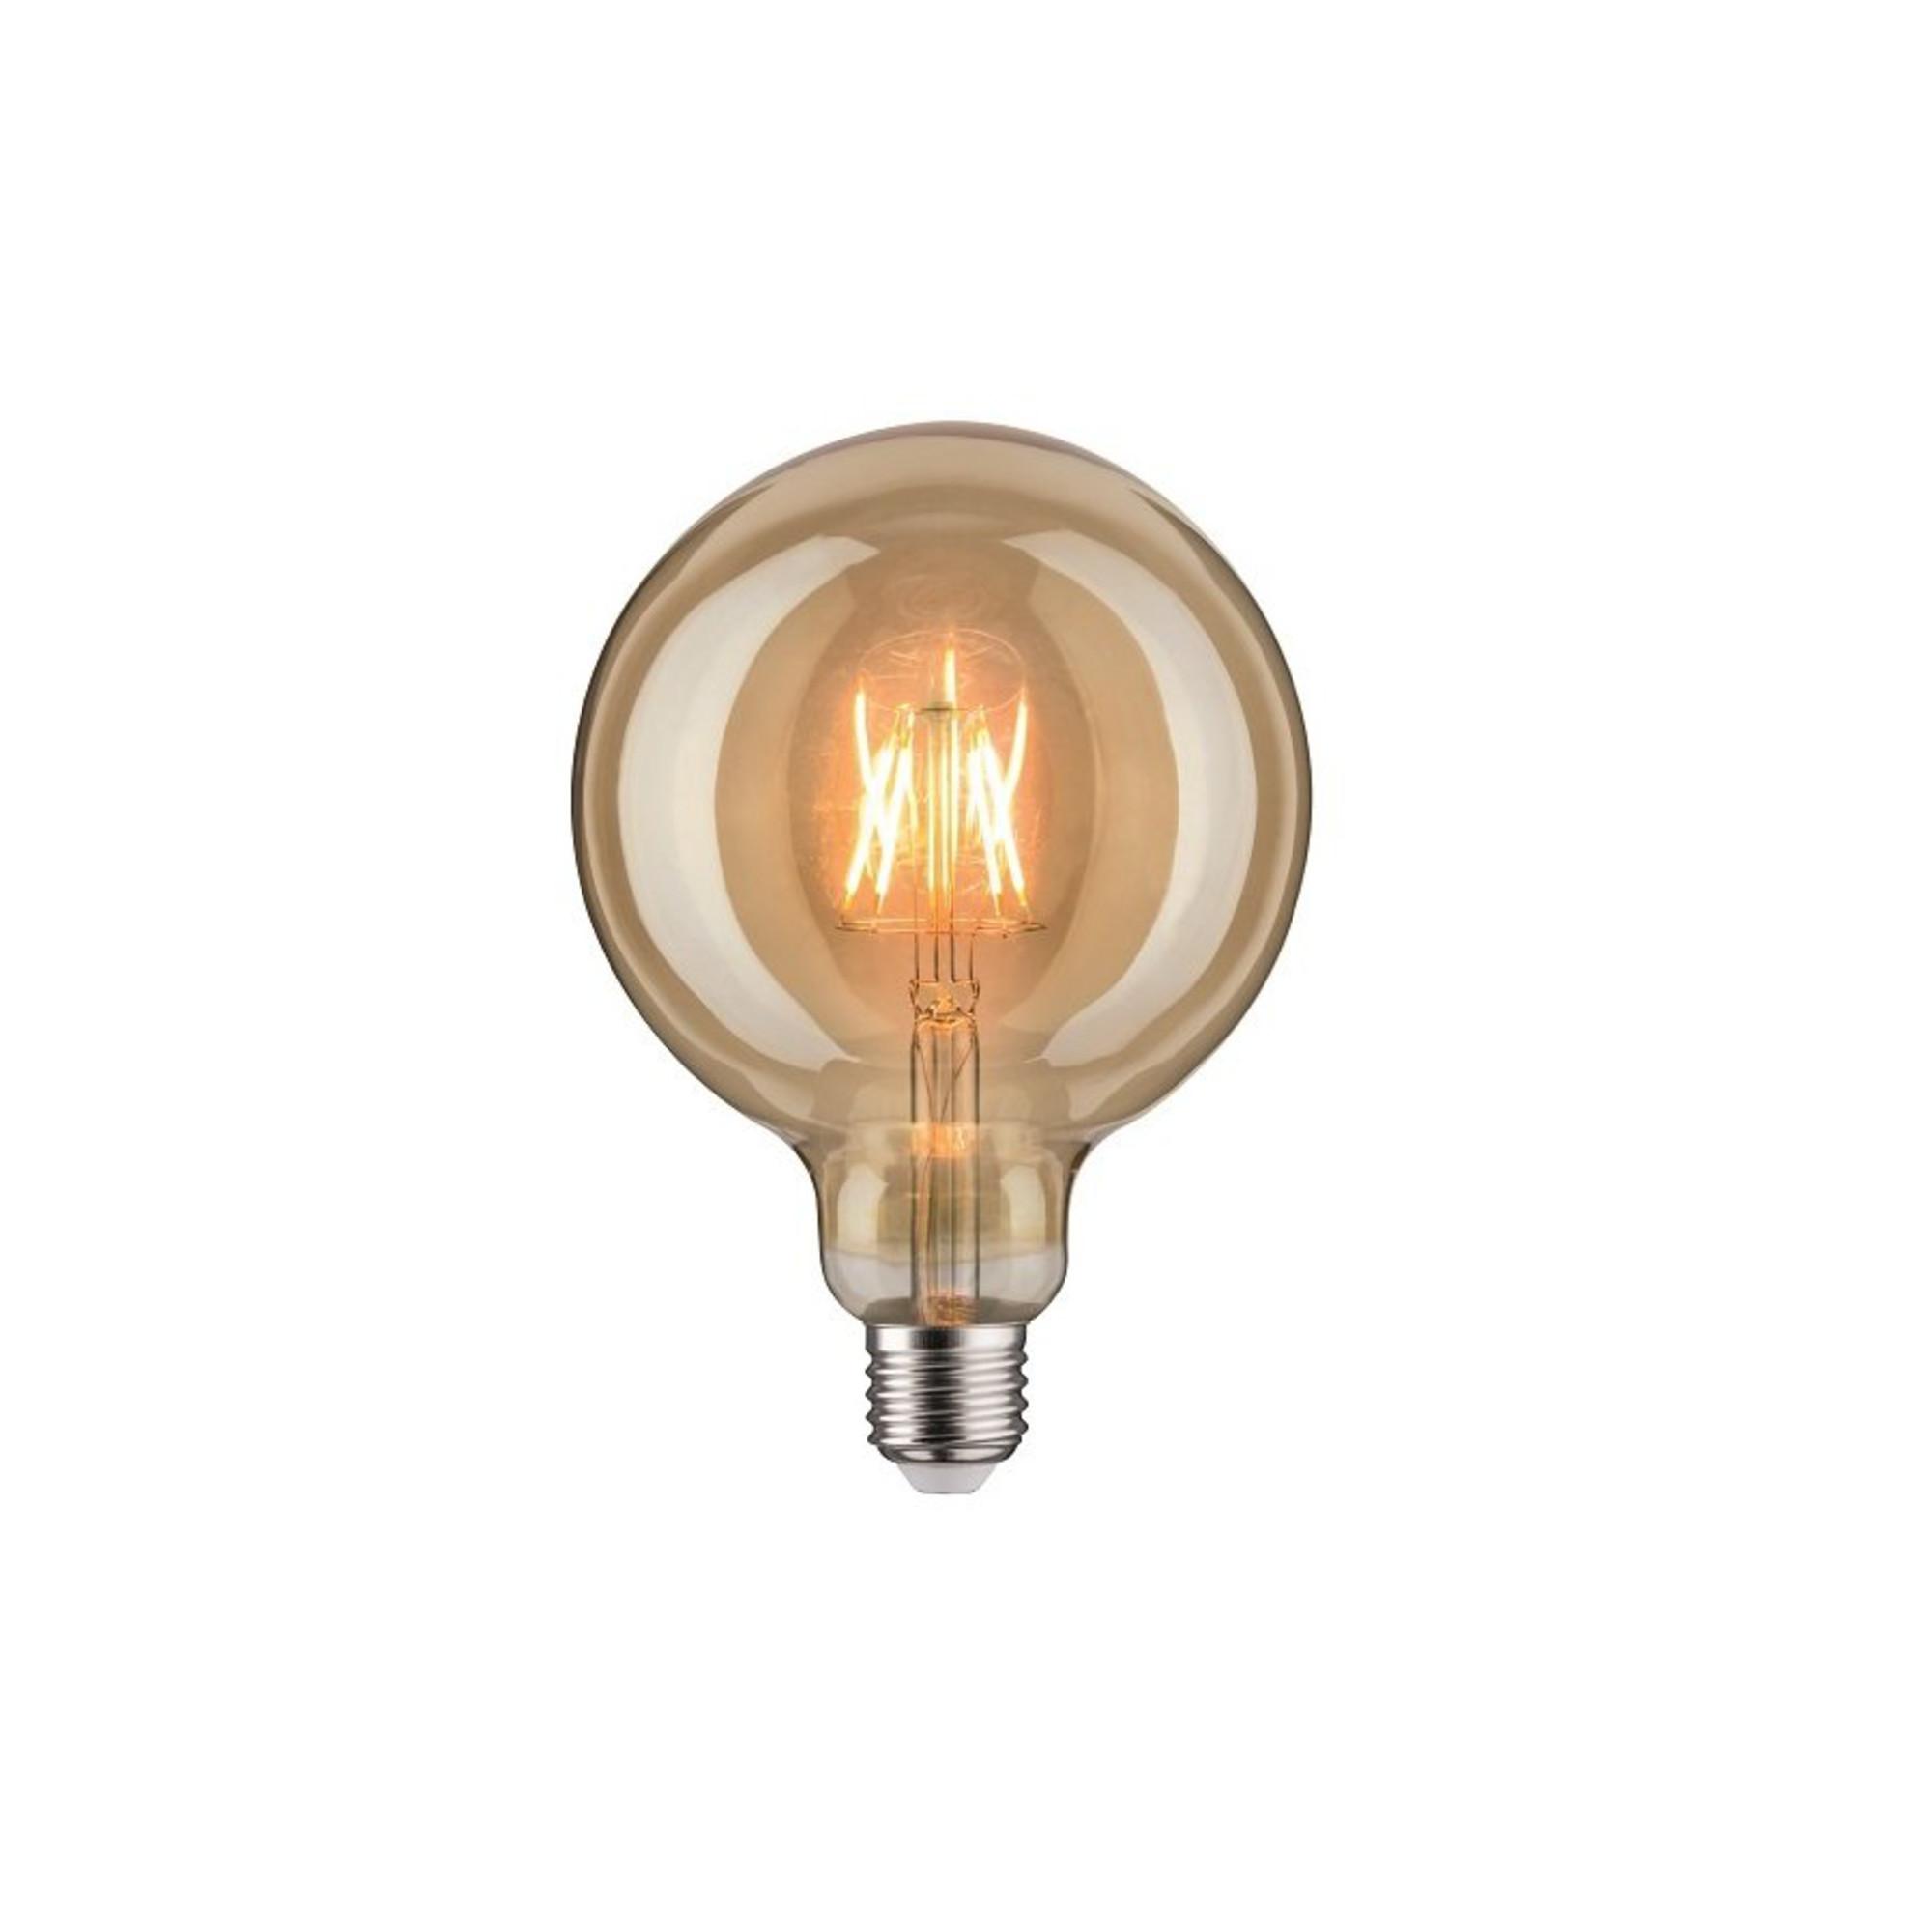 Лампа филаментная Paulmann Vintage Шар G125 6.5Вт 420лм 1700К Е27 230В Золото 28403.